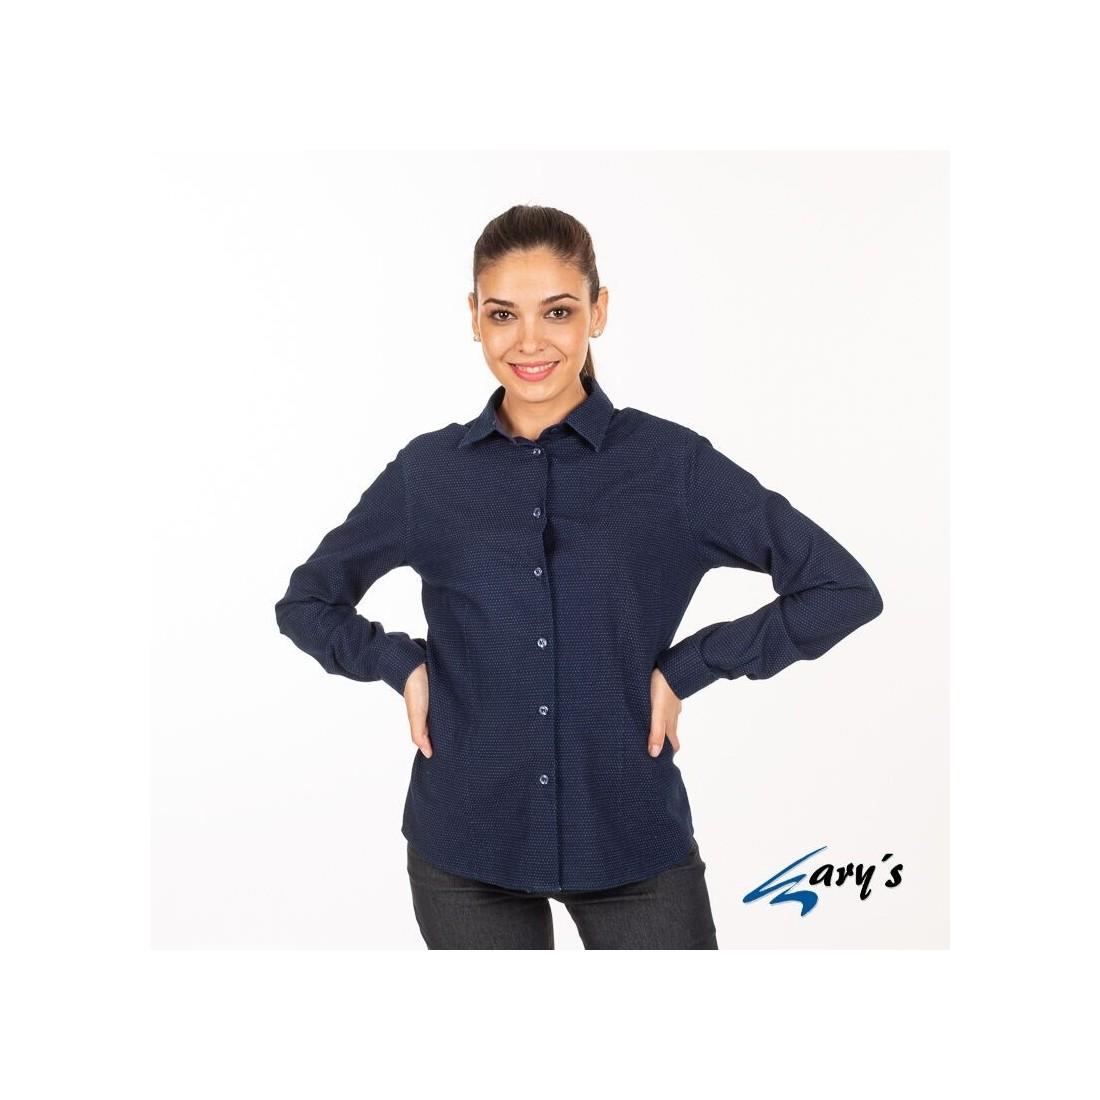 Camisa de trabajo color índigo modelo Fosca